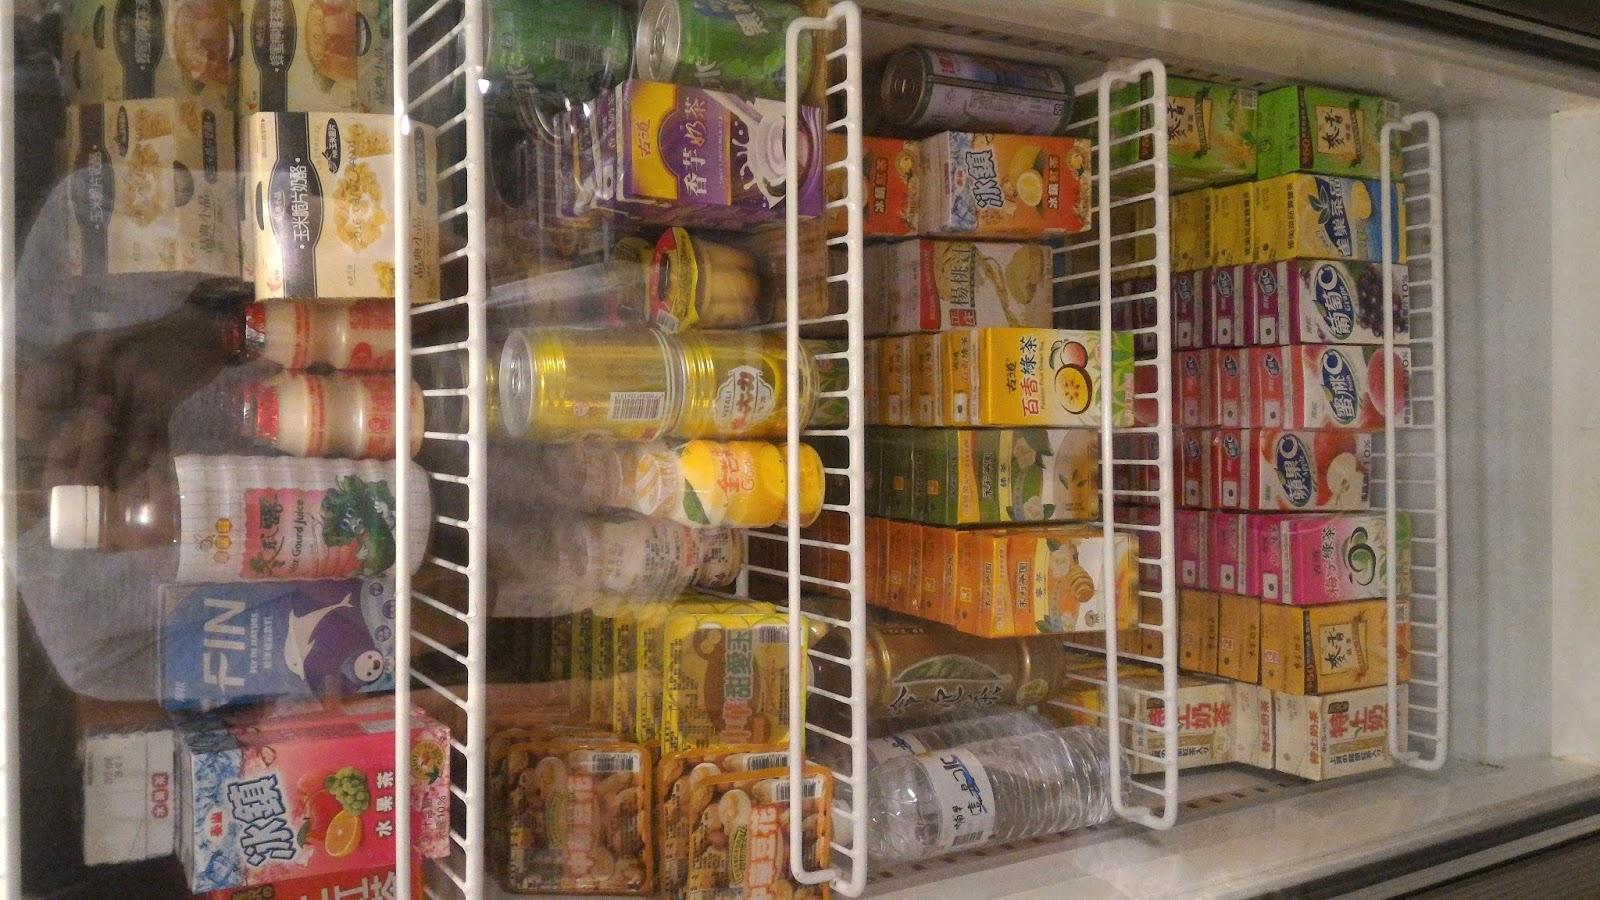 P 20160725 181357 - [食記] 廣香吃到飽日式涮涮鍋,超多種飲料、冰品及甜點!